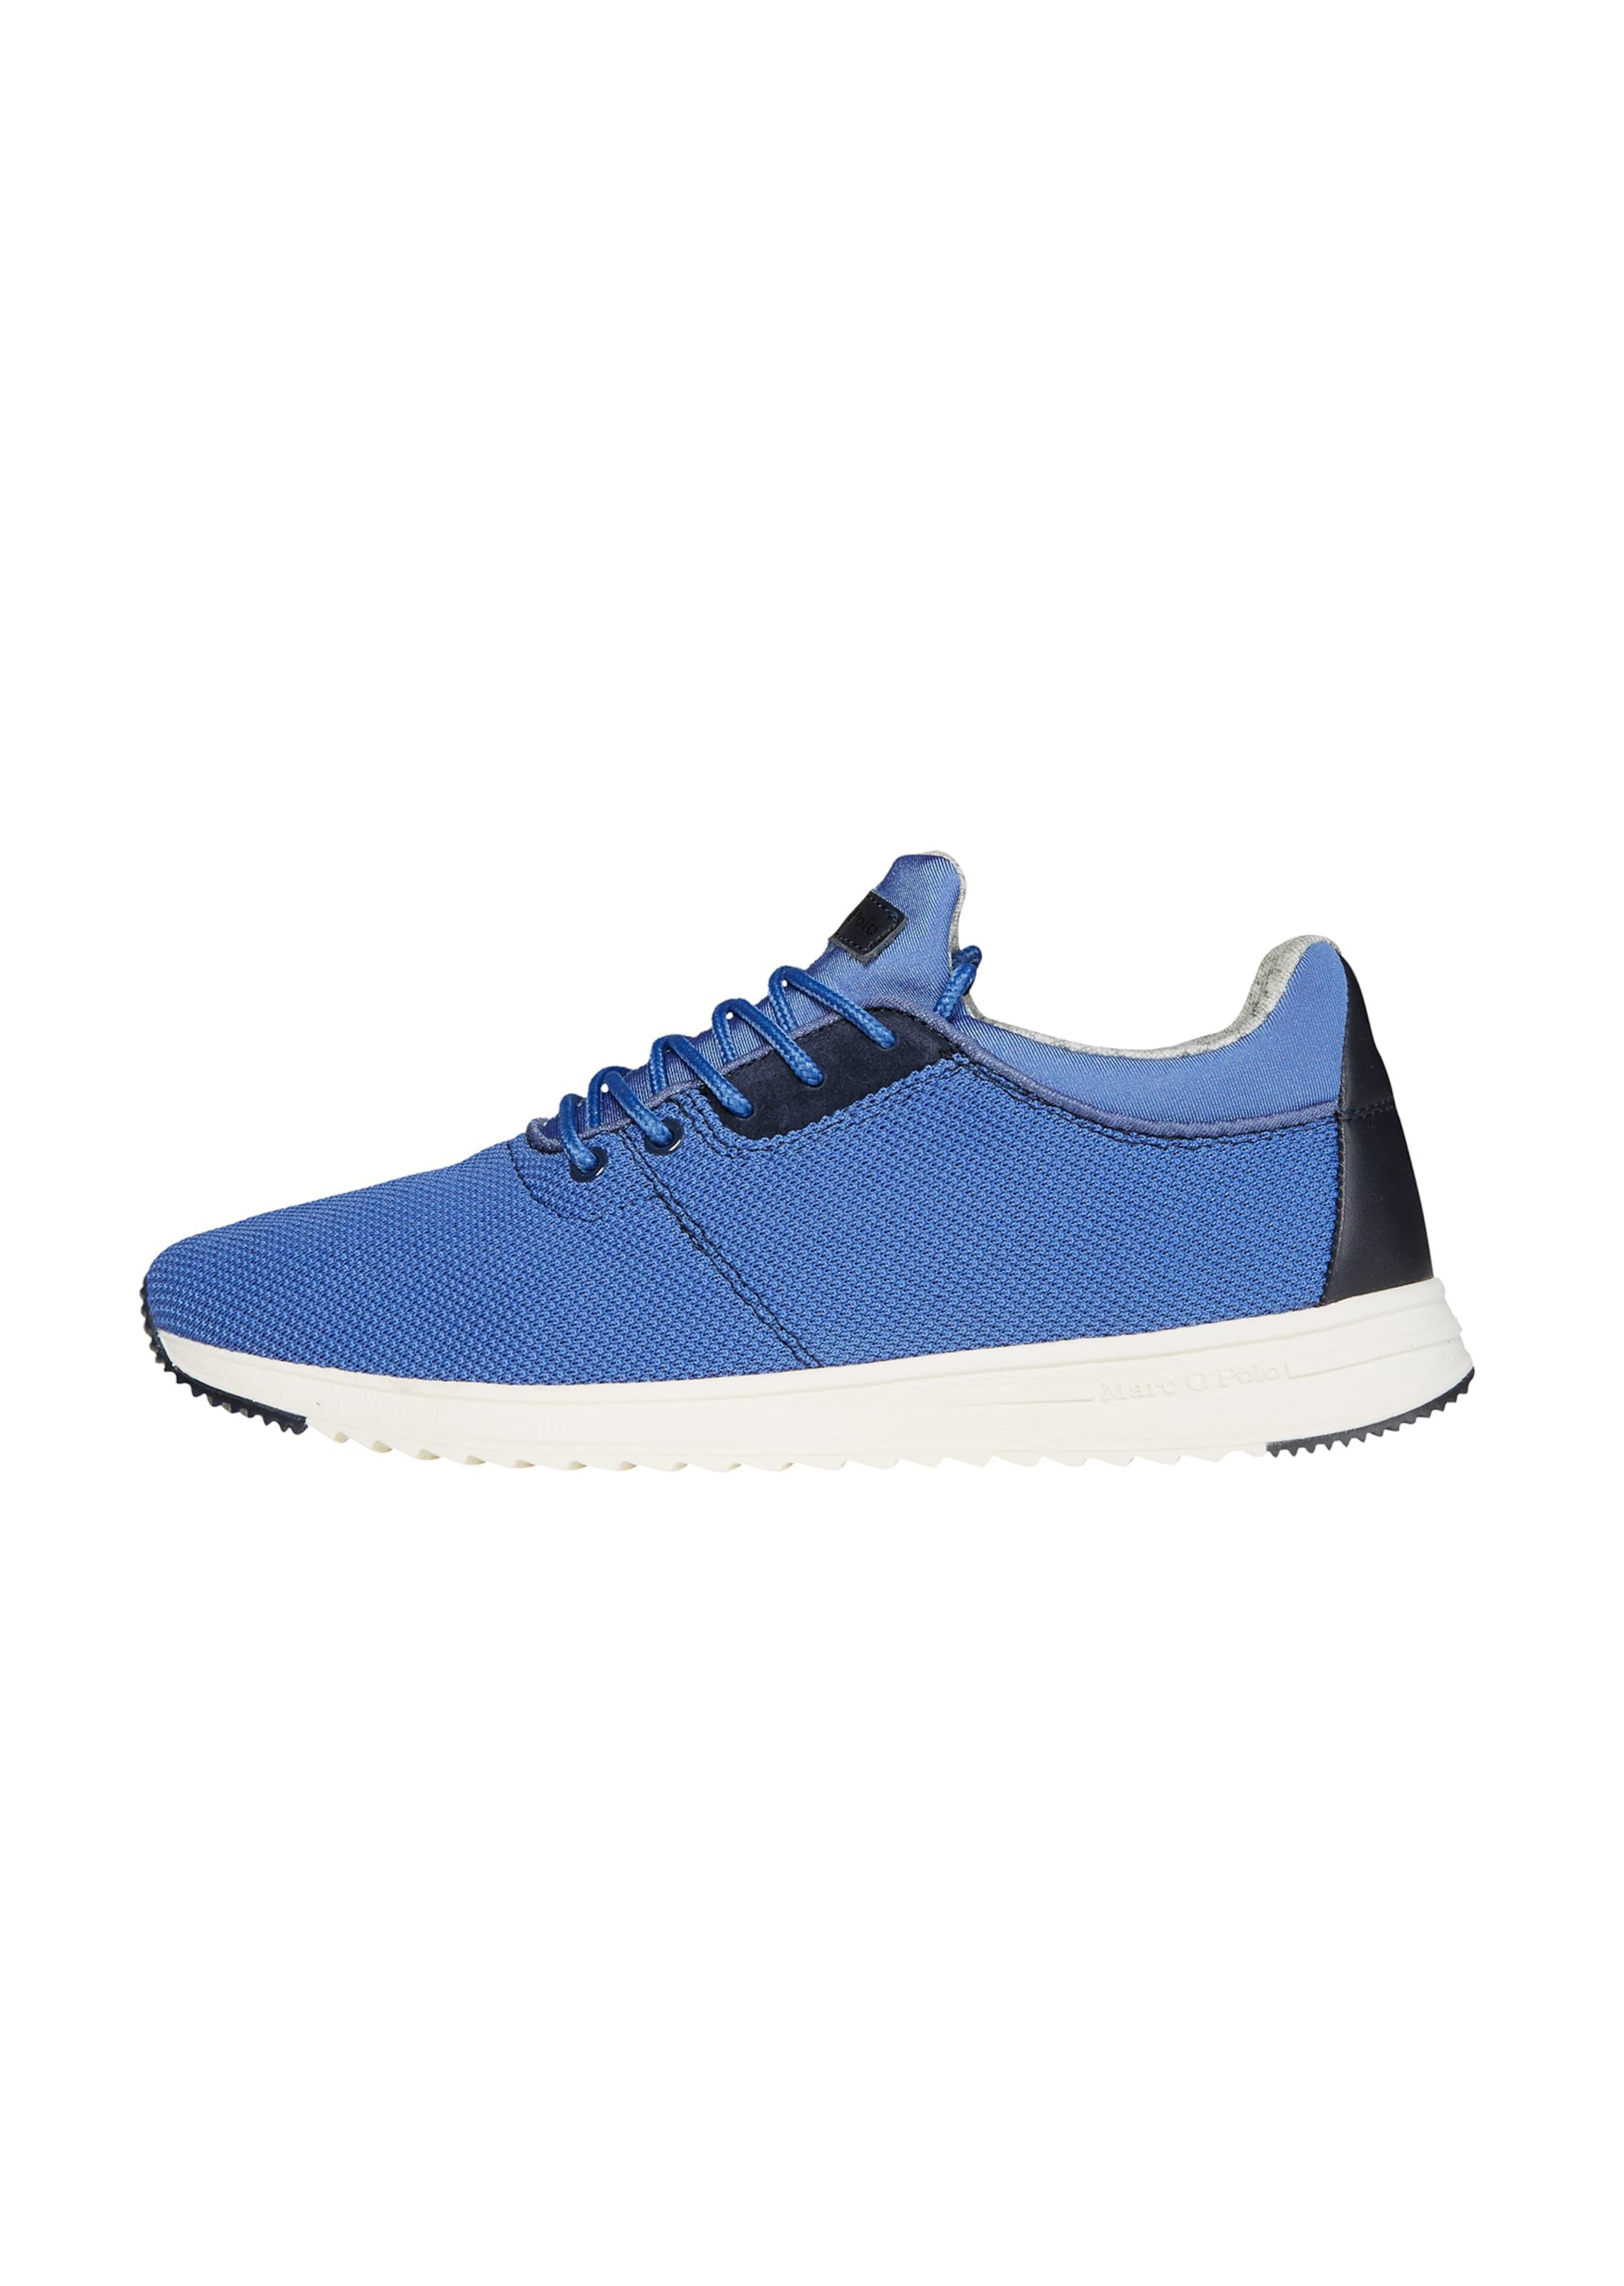 Haltbare Mode billige Schuhe Marc O'Polo | Sneaker Schuhe Schuhe Schuhe Gut getragene Schuhe d22d27